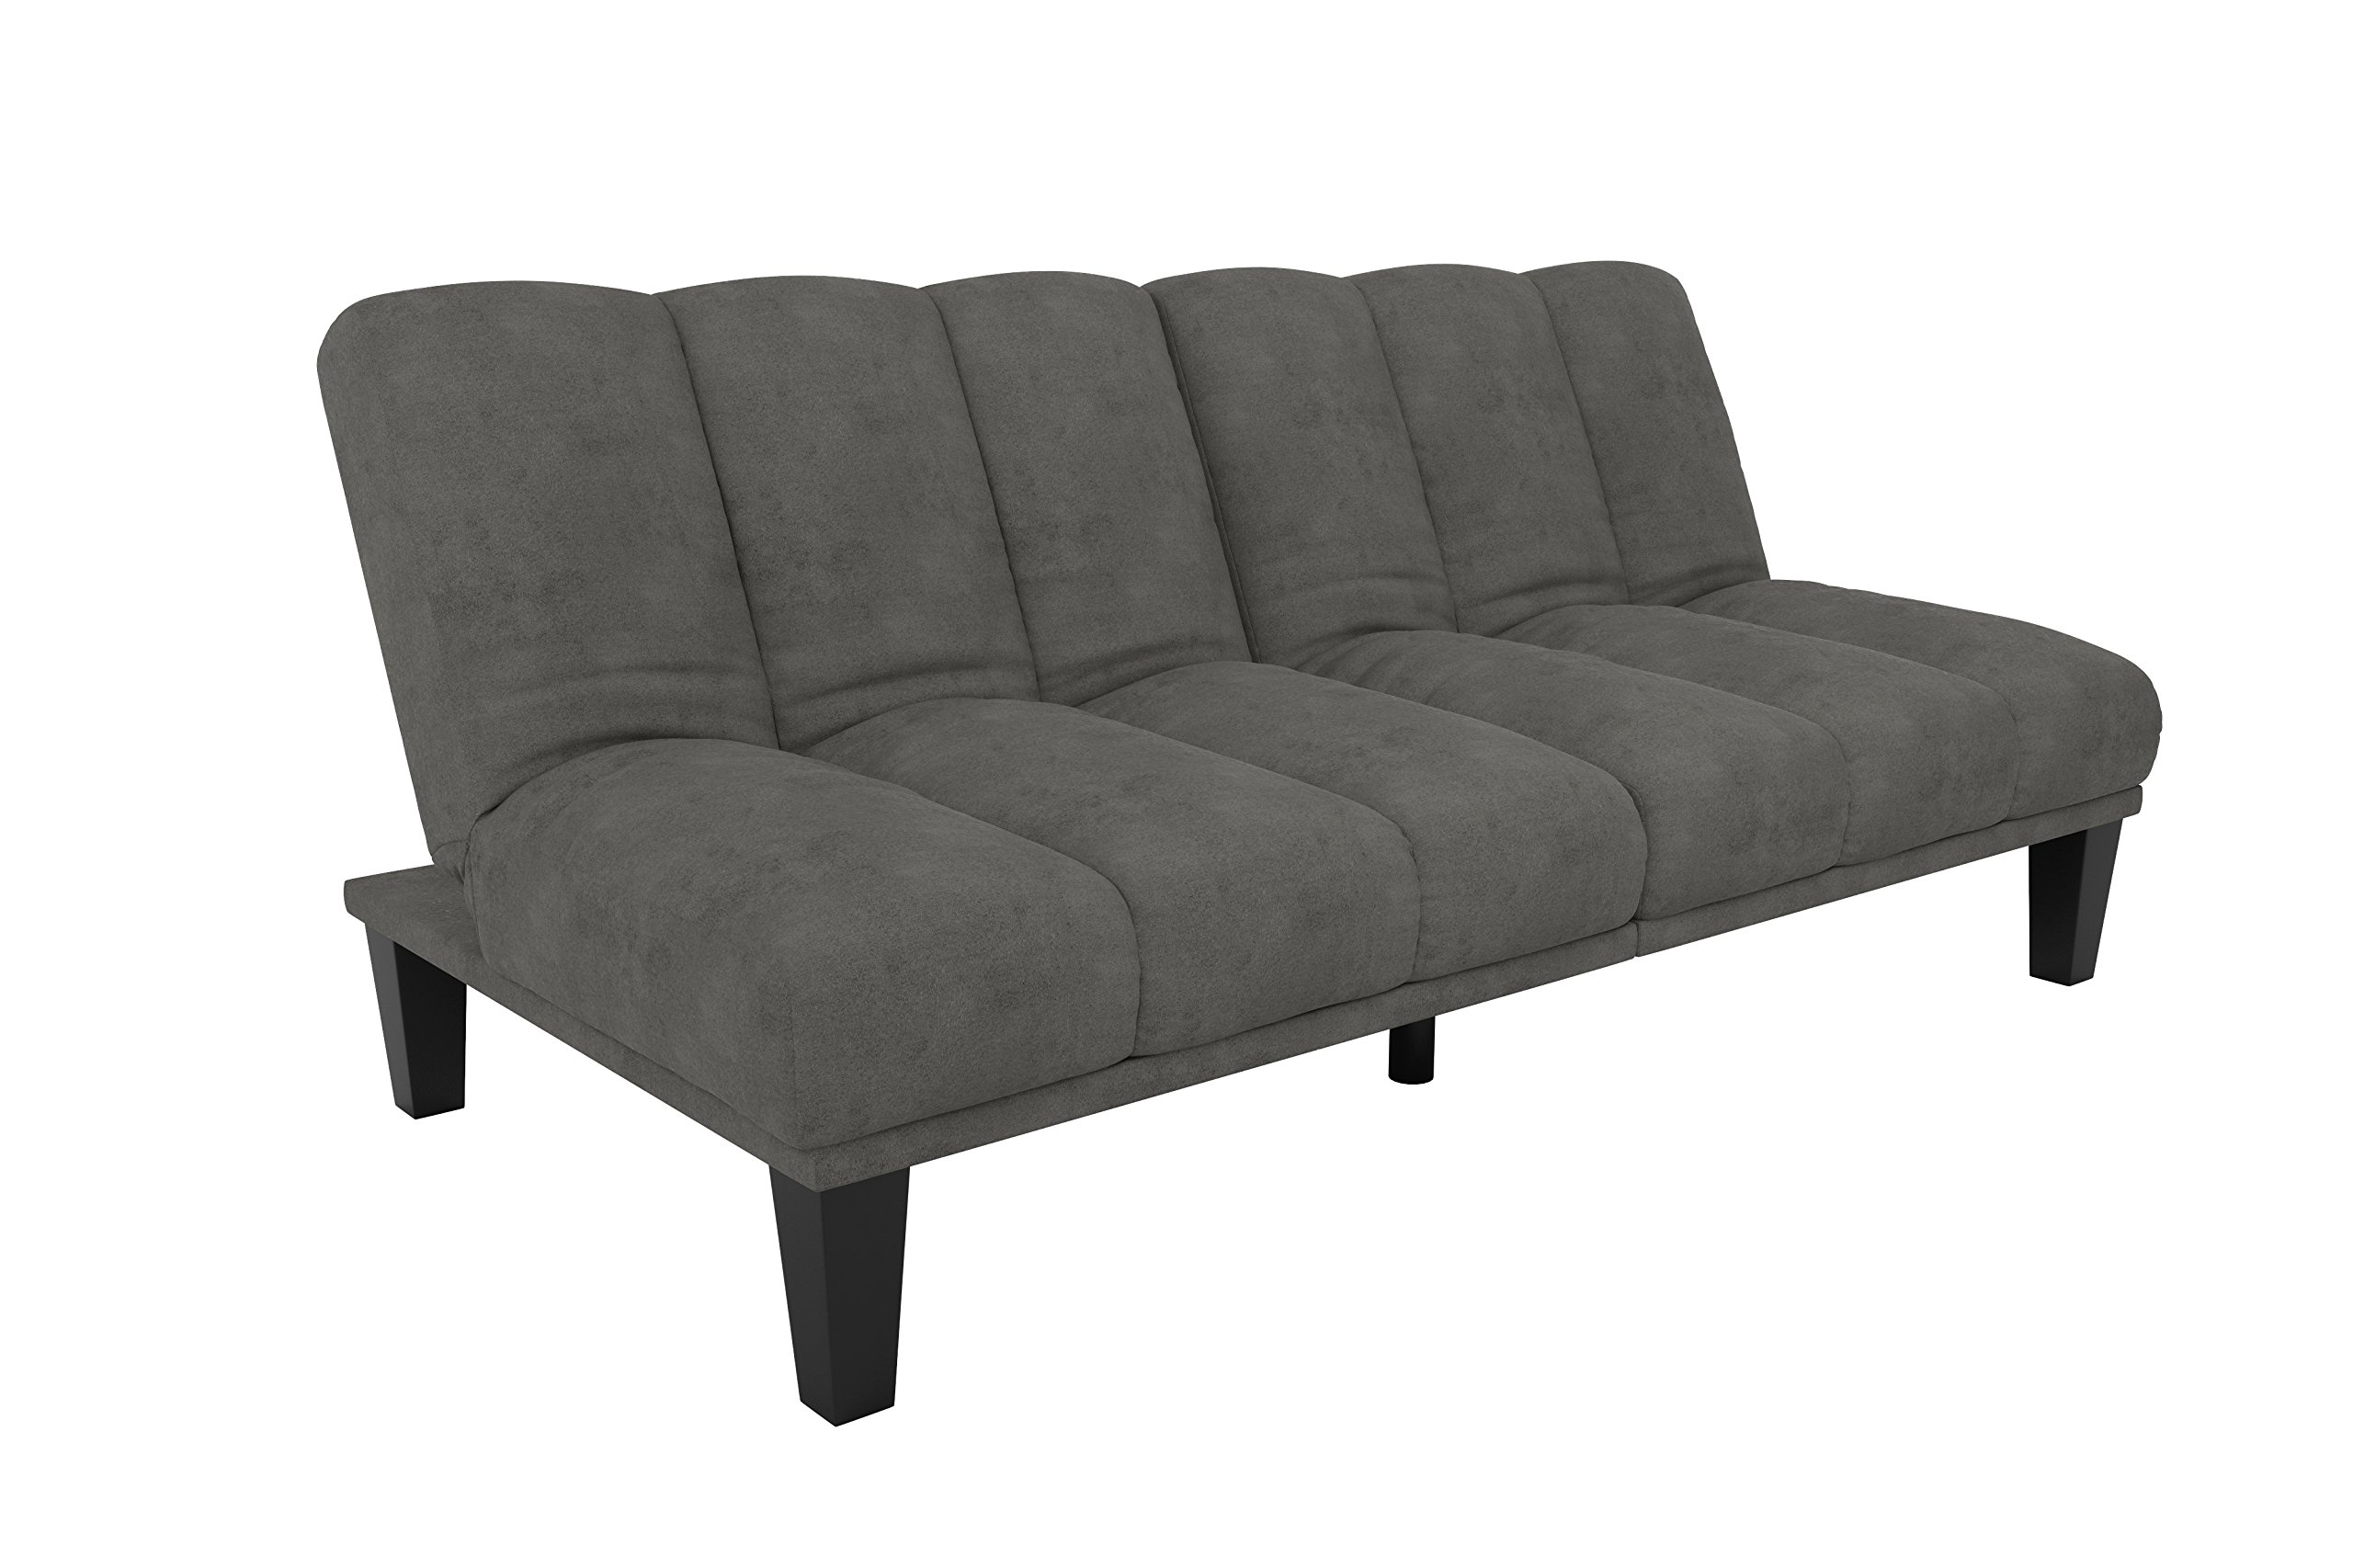 DHP Hamilton Estate Premium Sofa Futon Sleeper Comfortable Plush Upholstery, Rich Gray by DHP (Image #5)